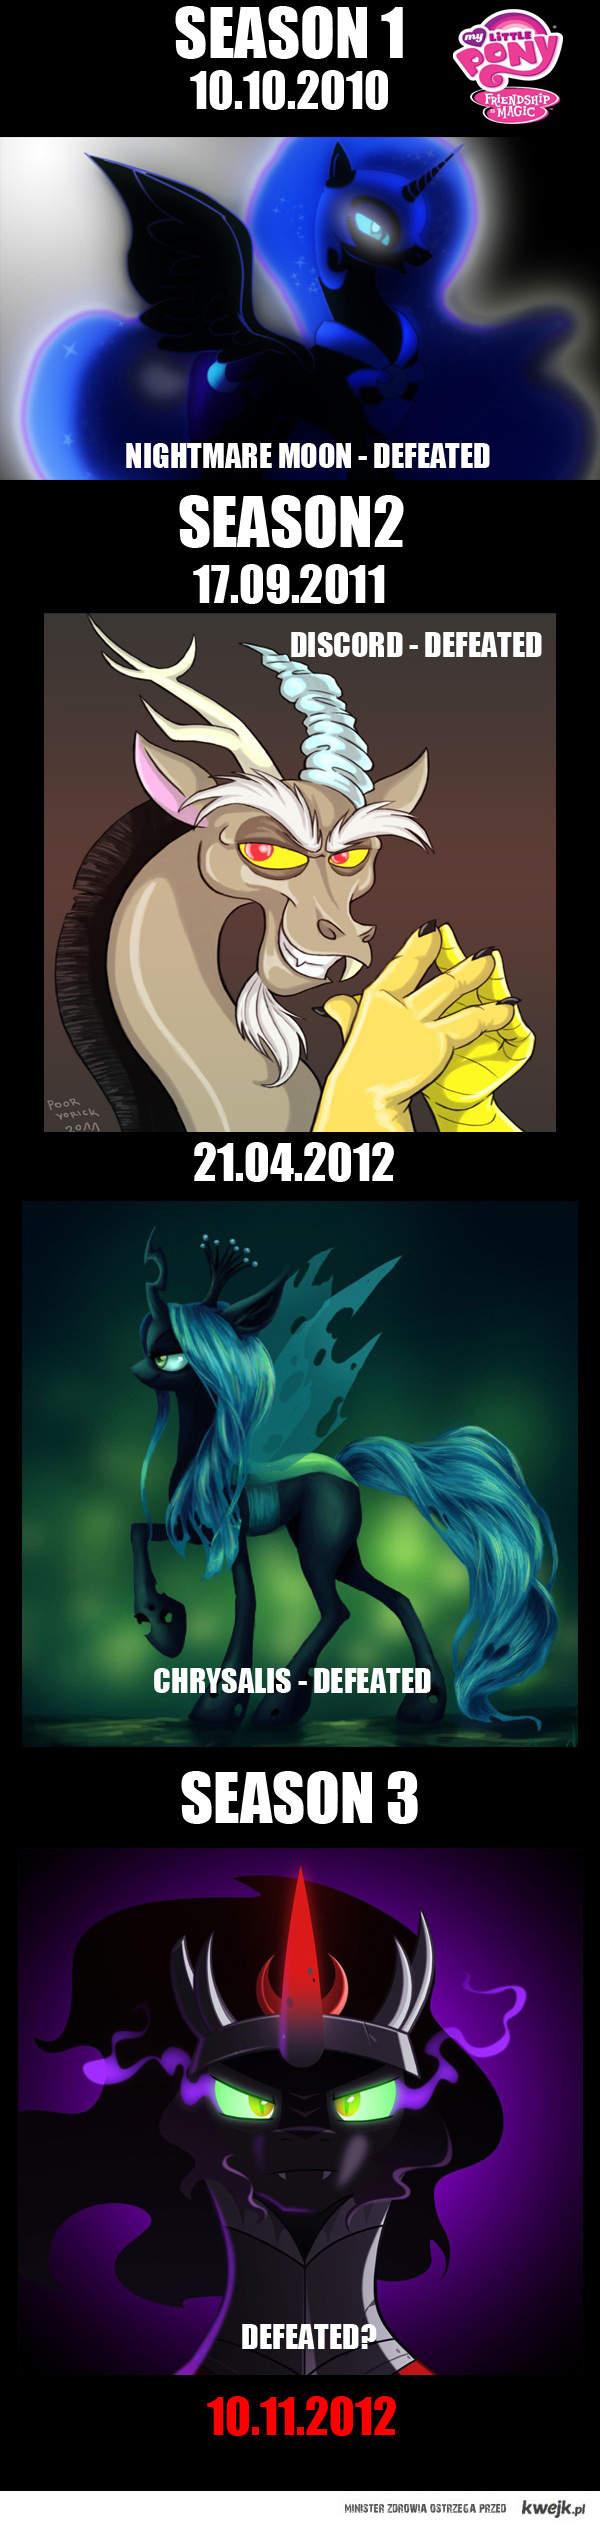 Season 3 My Little Pony